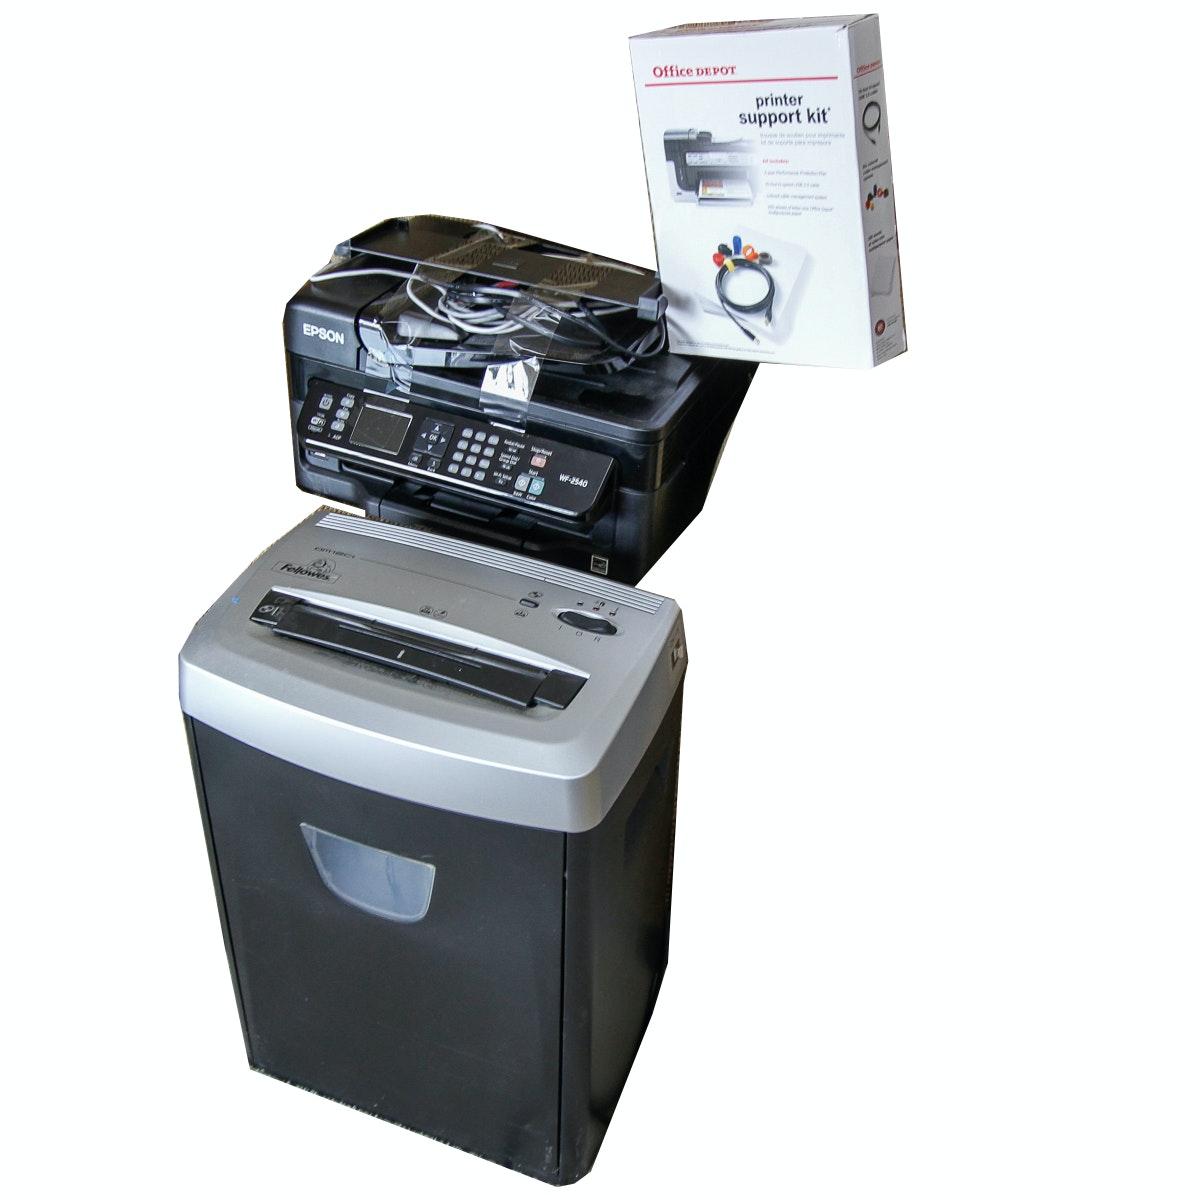 Epson WF-2540 Printer and Fellows Shredder